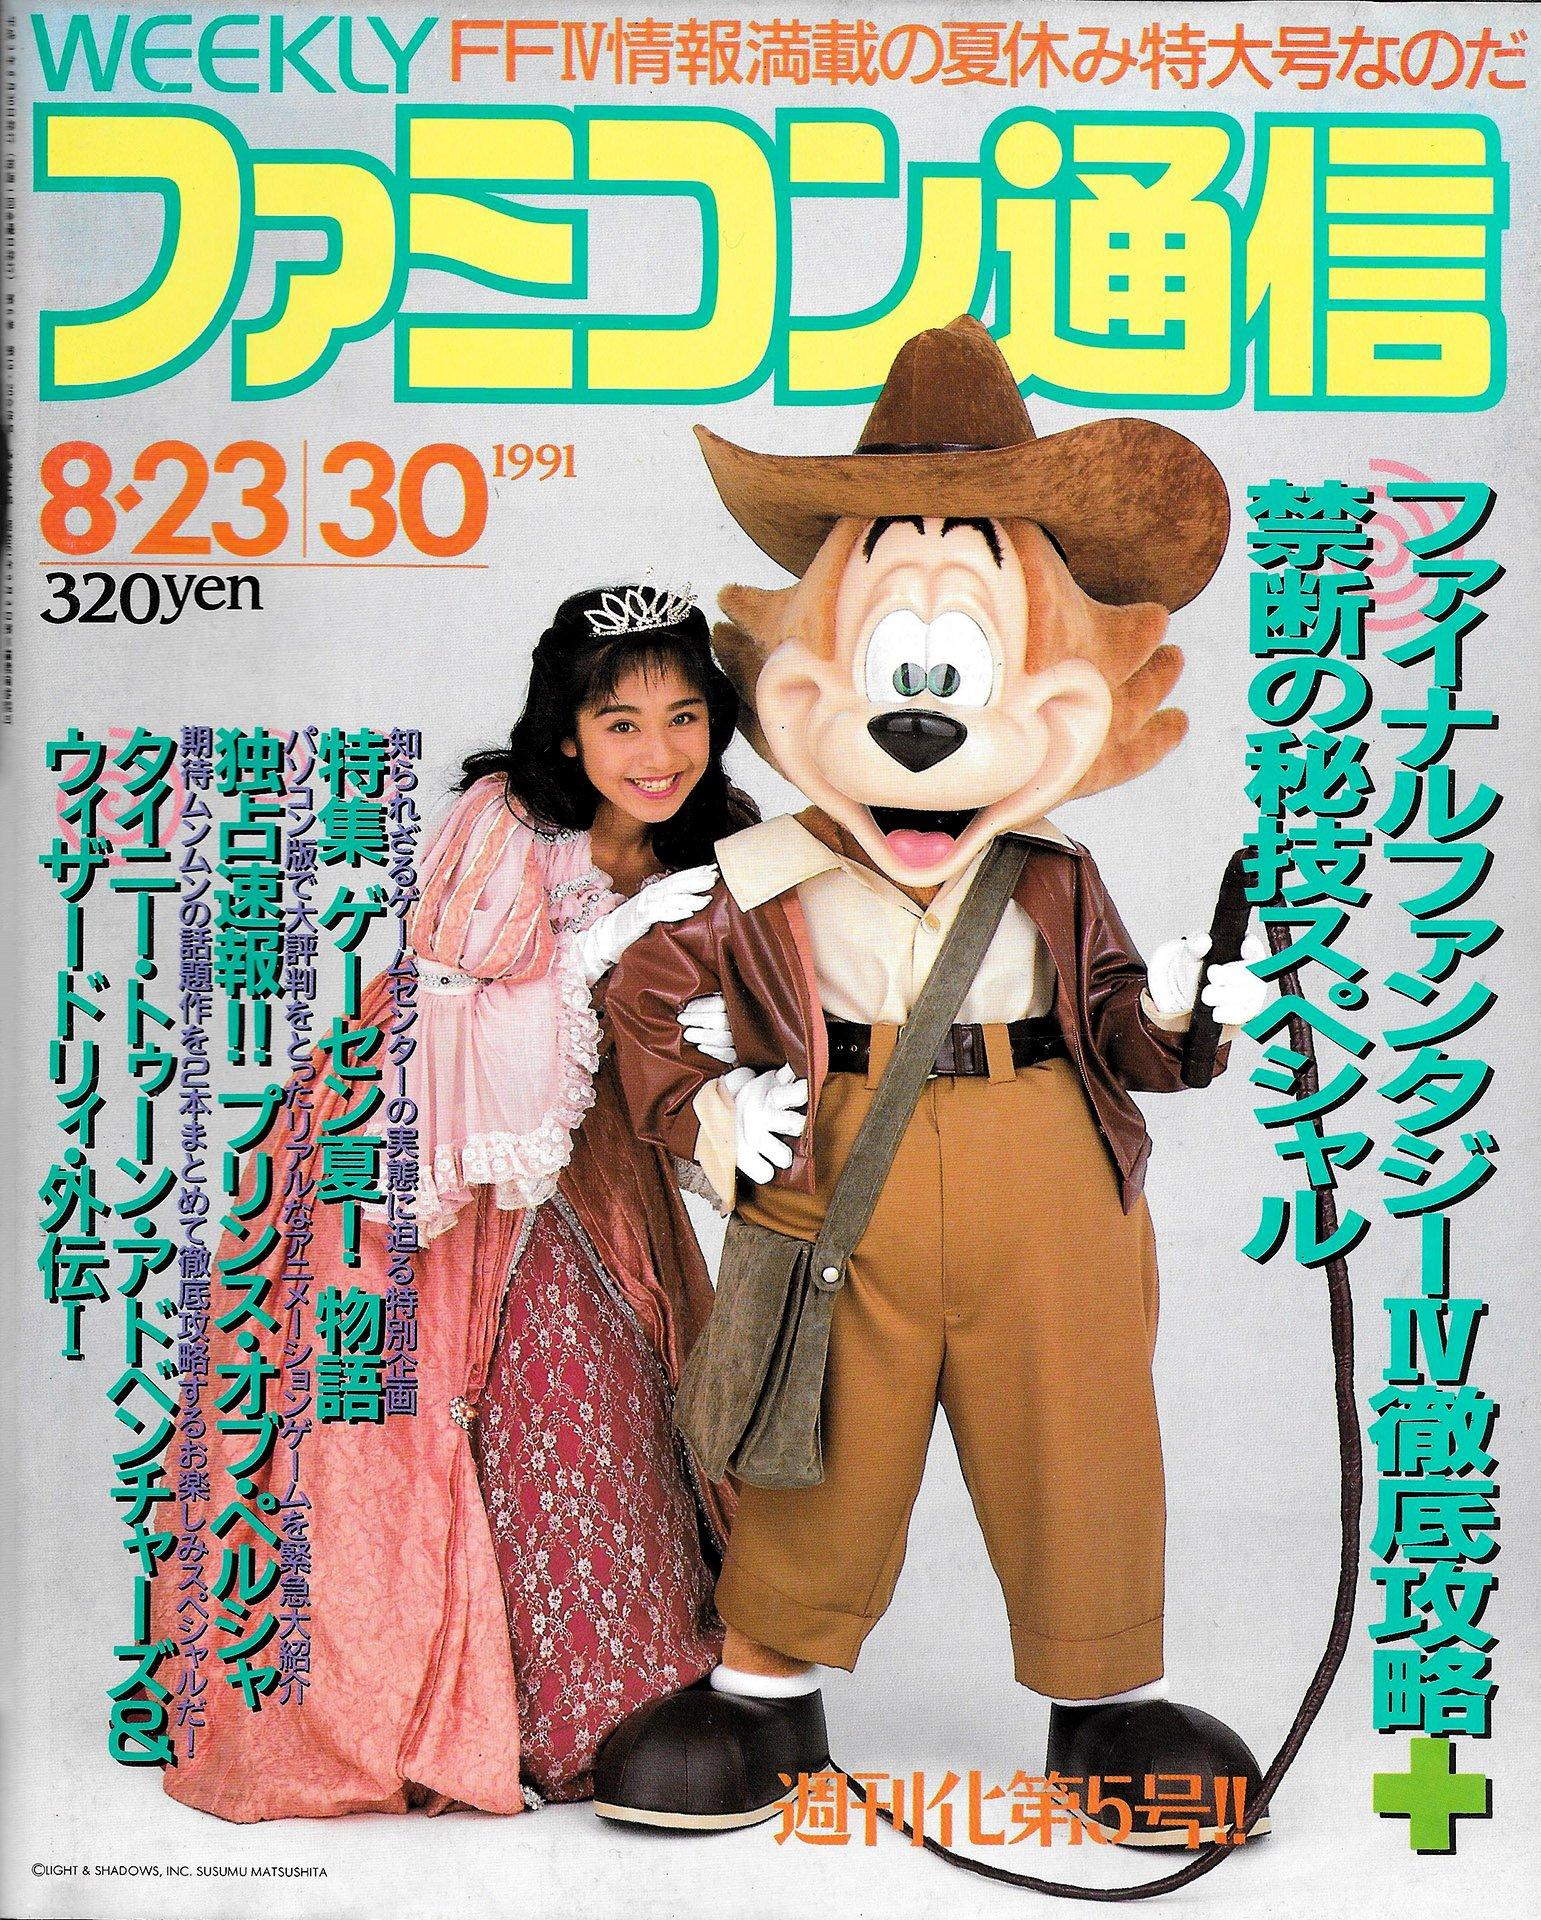 Famitsu 0140/0141 (August 23/30, 1991)